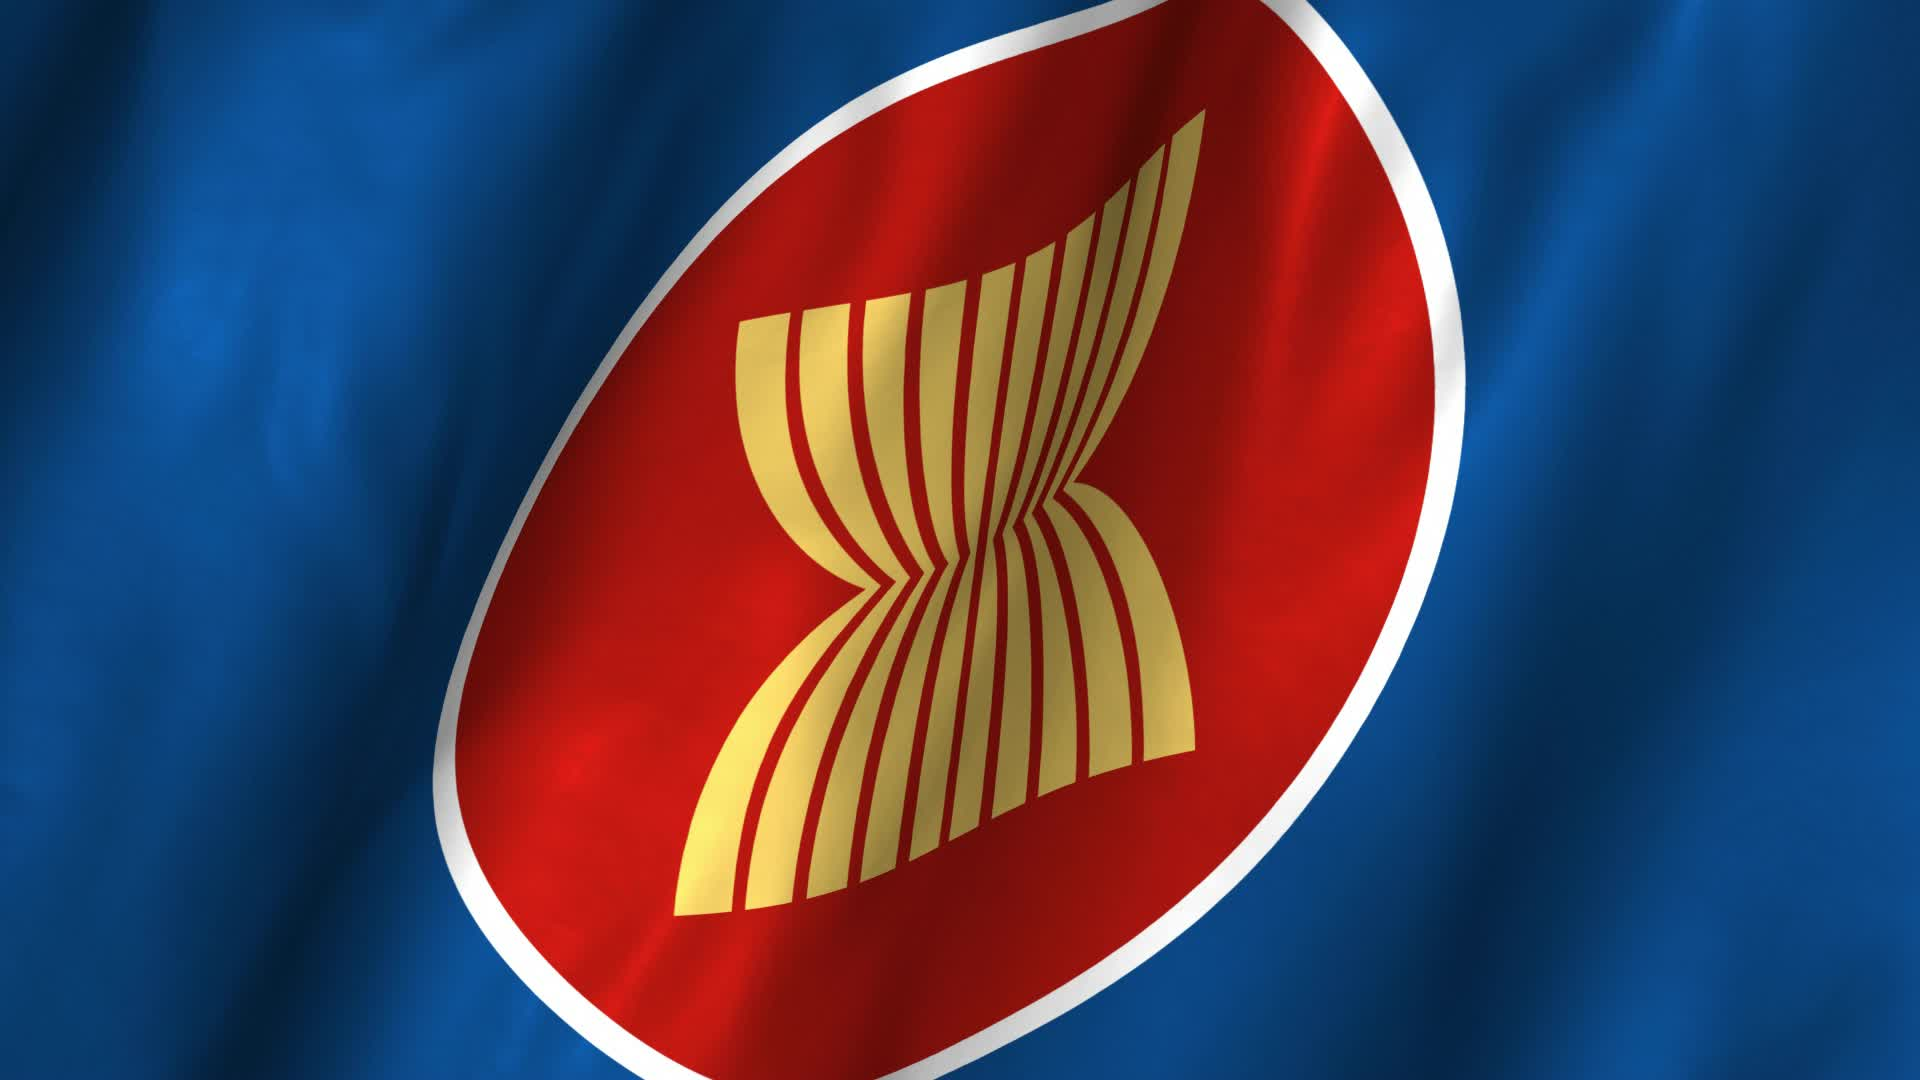 stock video asean waving flag buy now 12238999 pond5